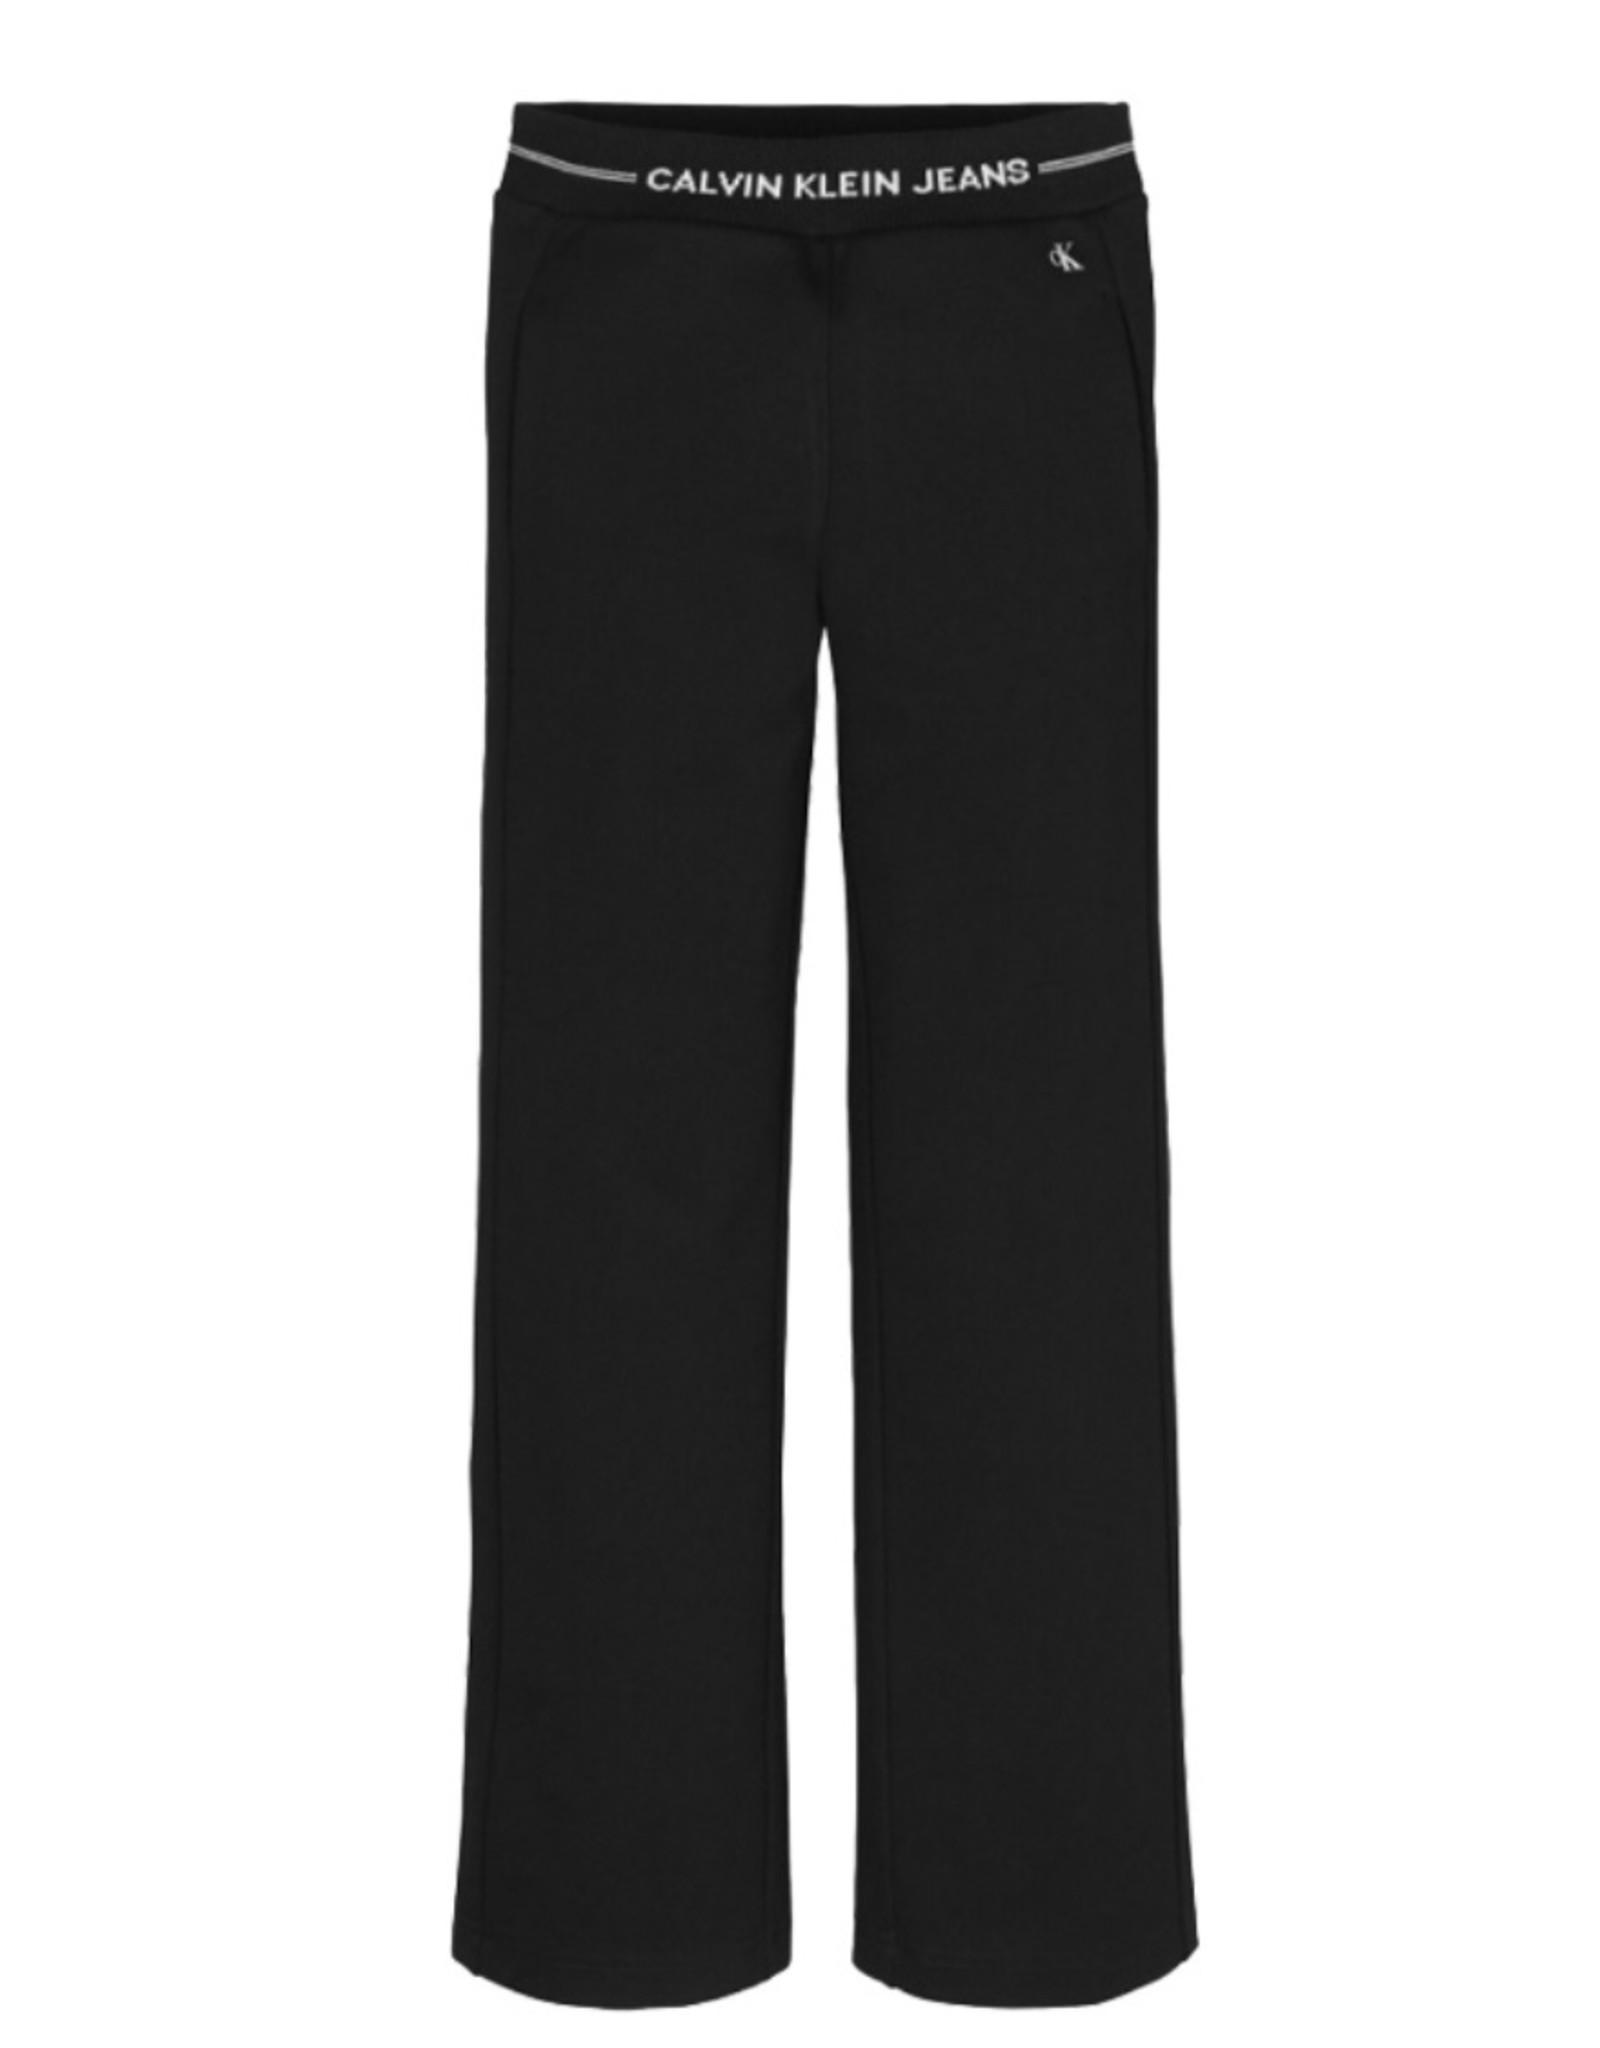 Calvin Klein 1002 sweatpants